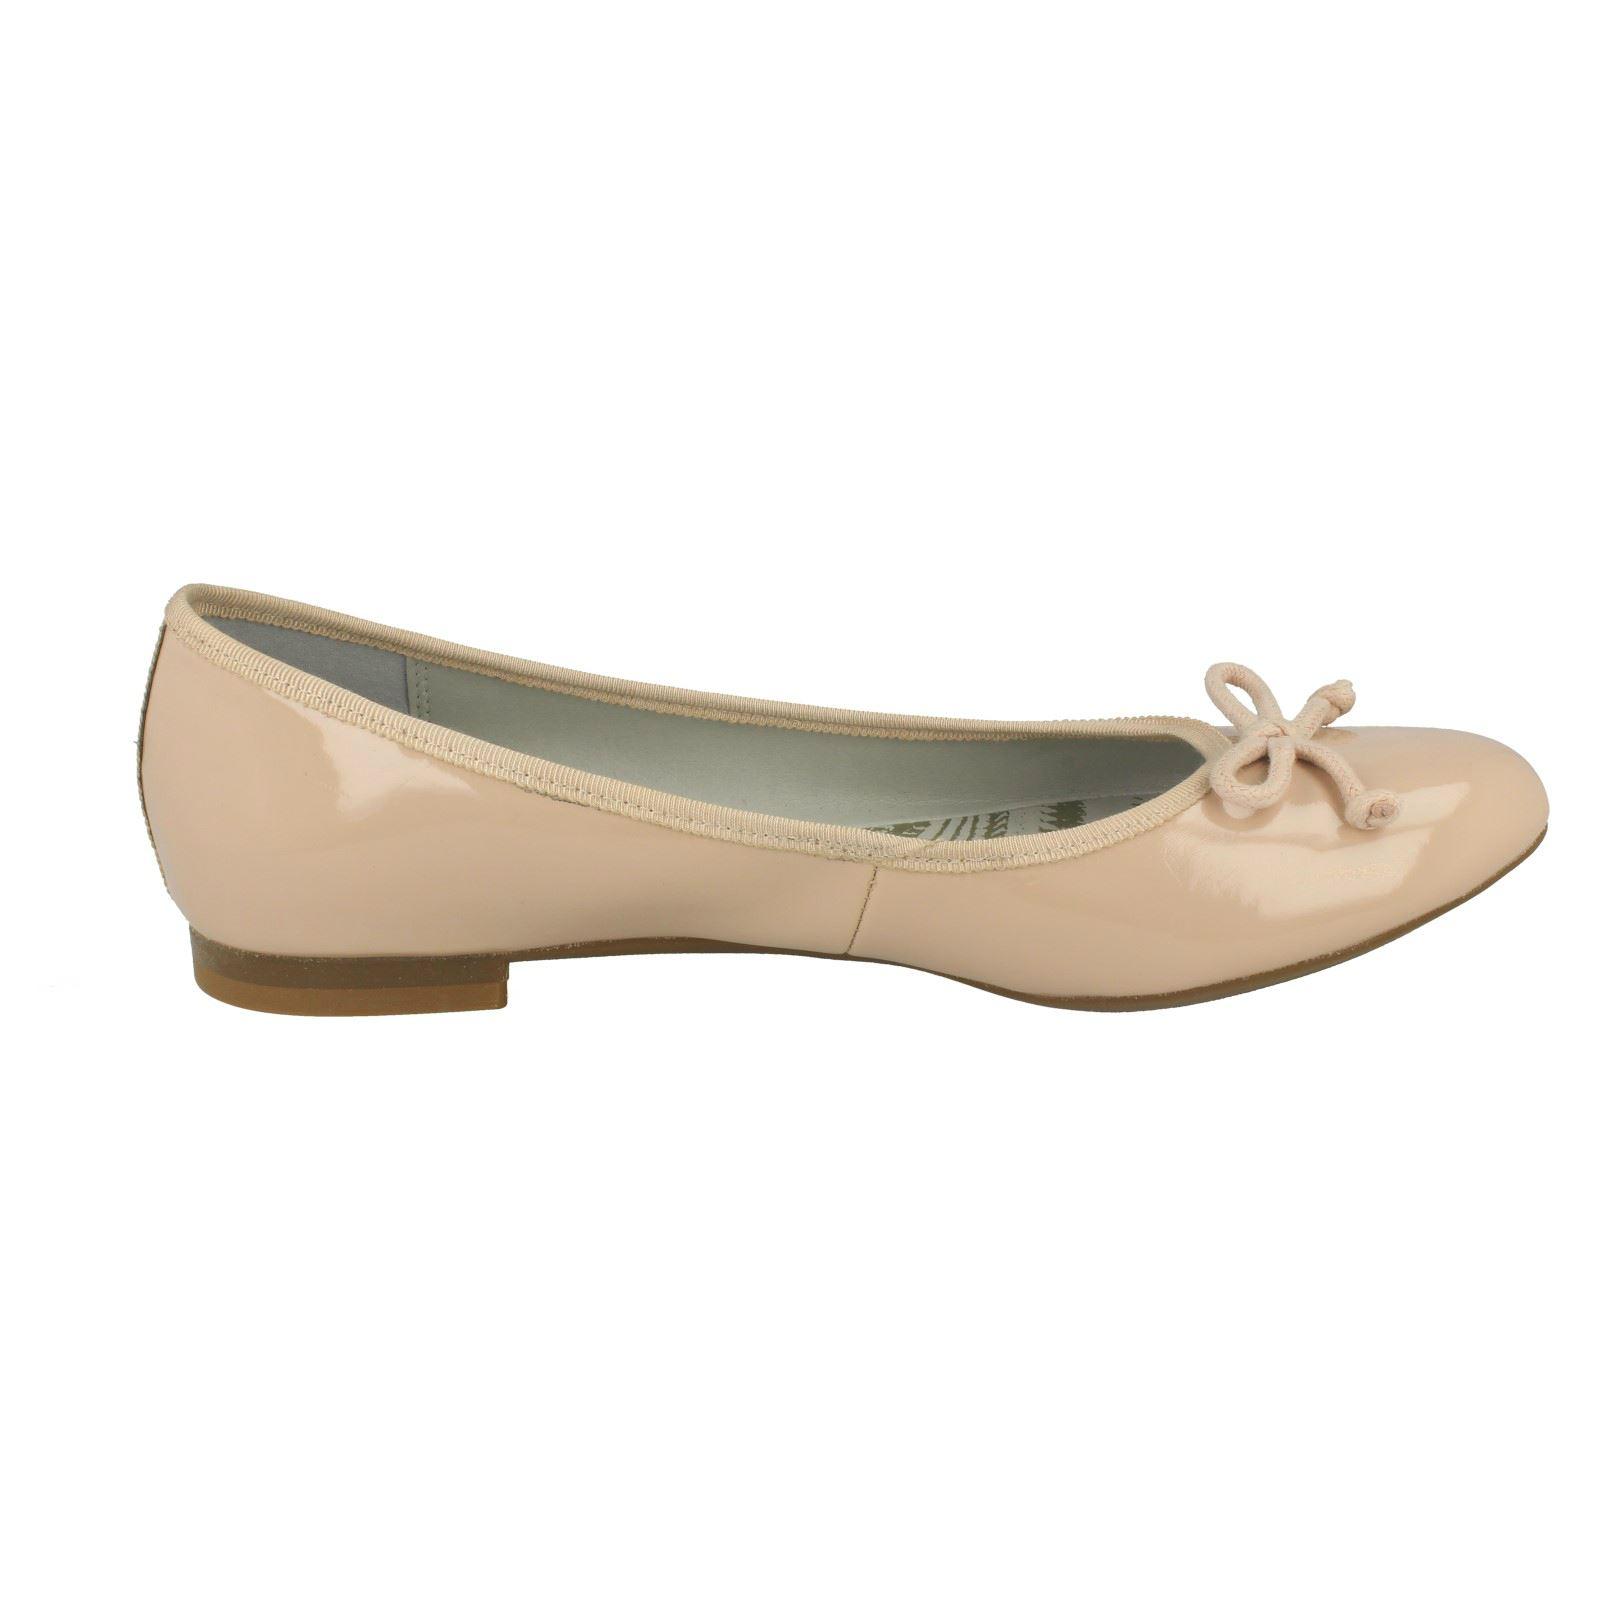 Ladies-Clarks-Carousel-Ride-Flat-Ballerina-Shoes